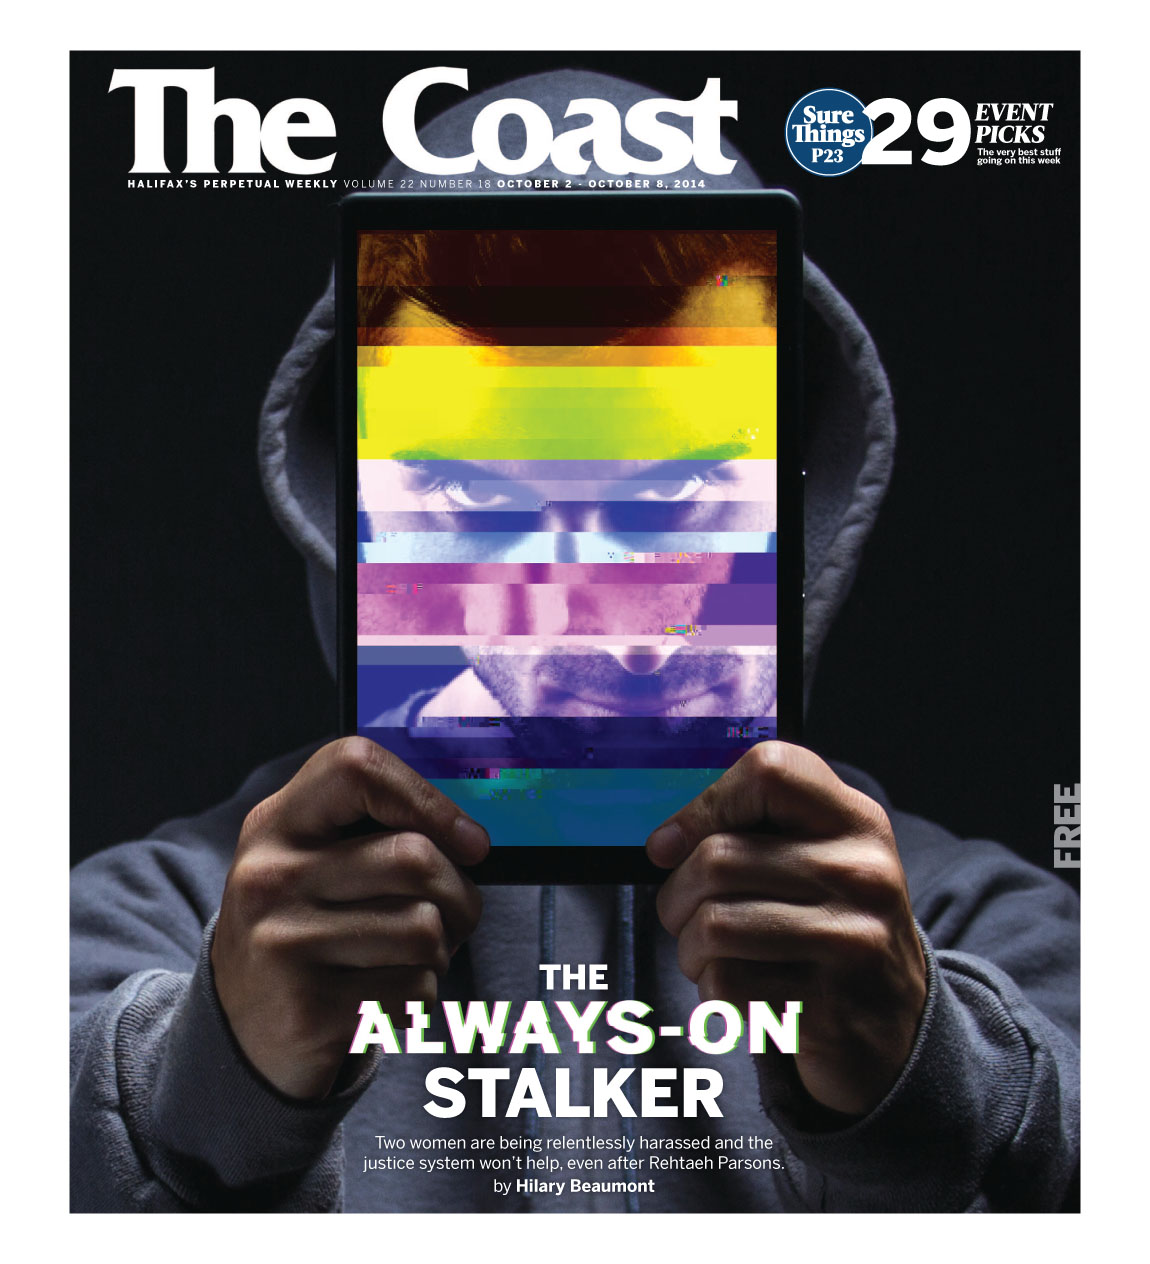 The Always-On Stalker